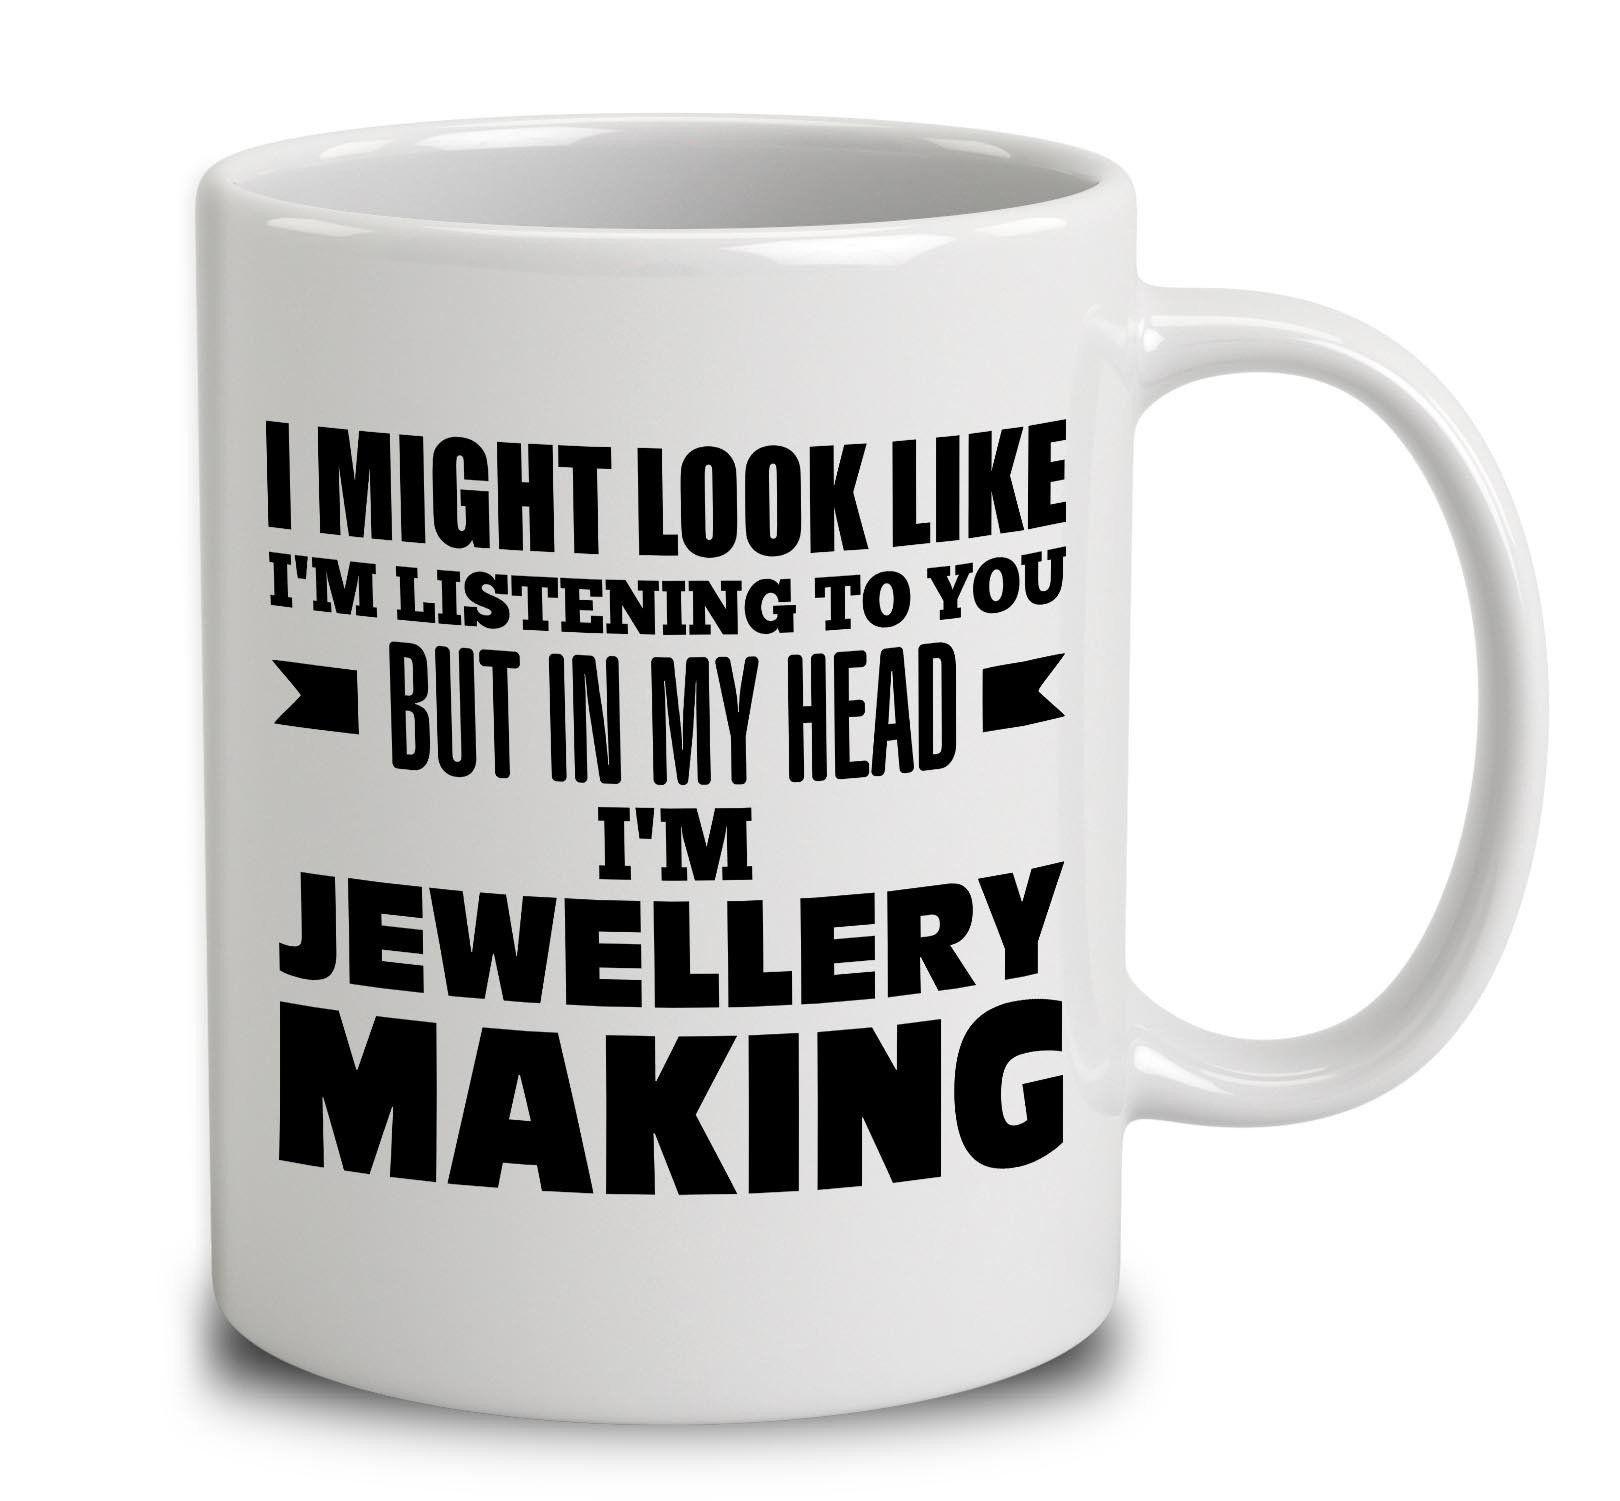 In My Head I'm Jewellery Making